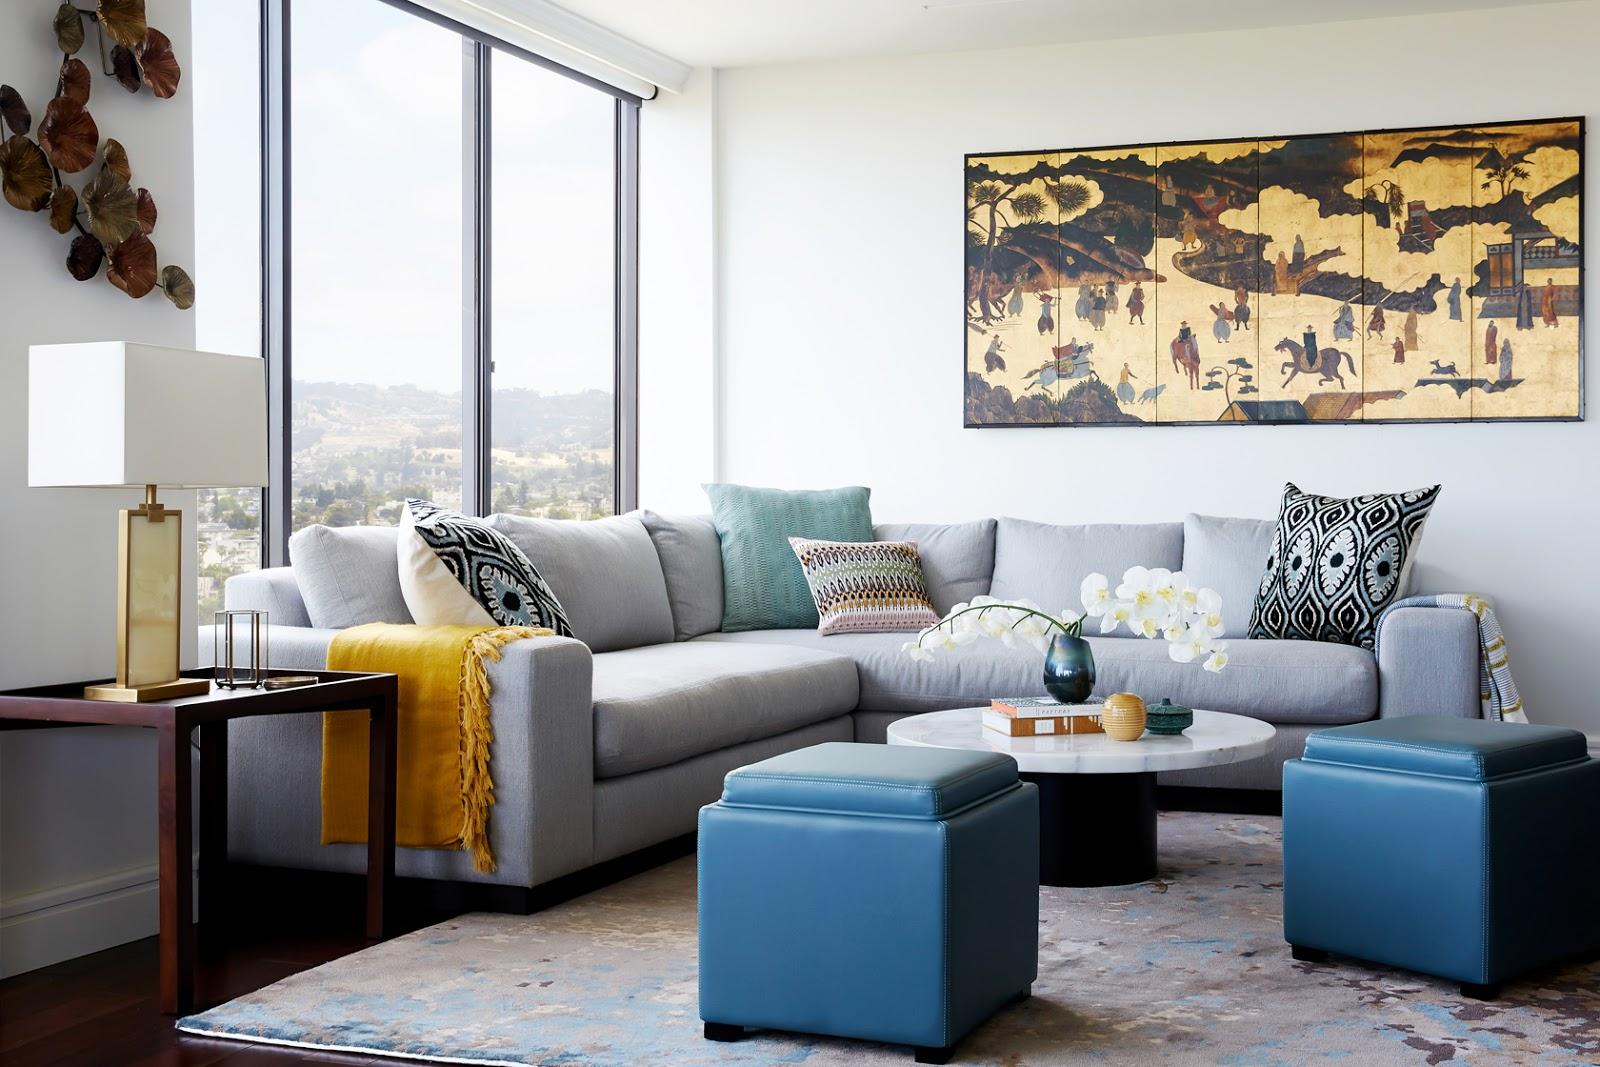 airbnb guest space table sofa art joyful color texture living room